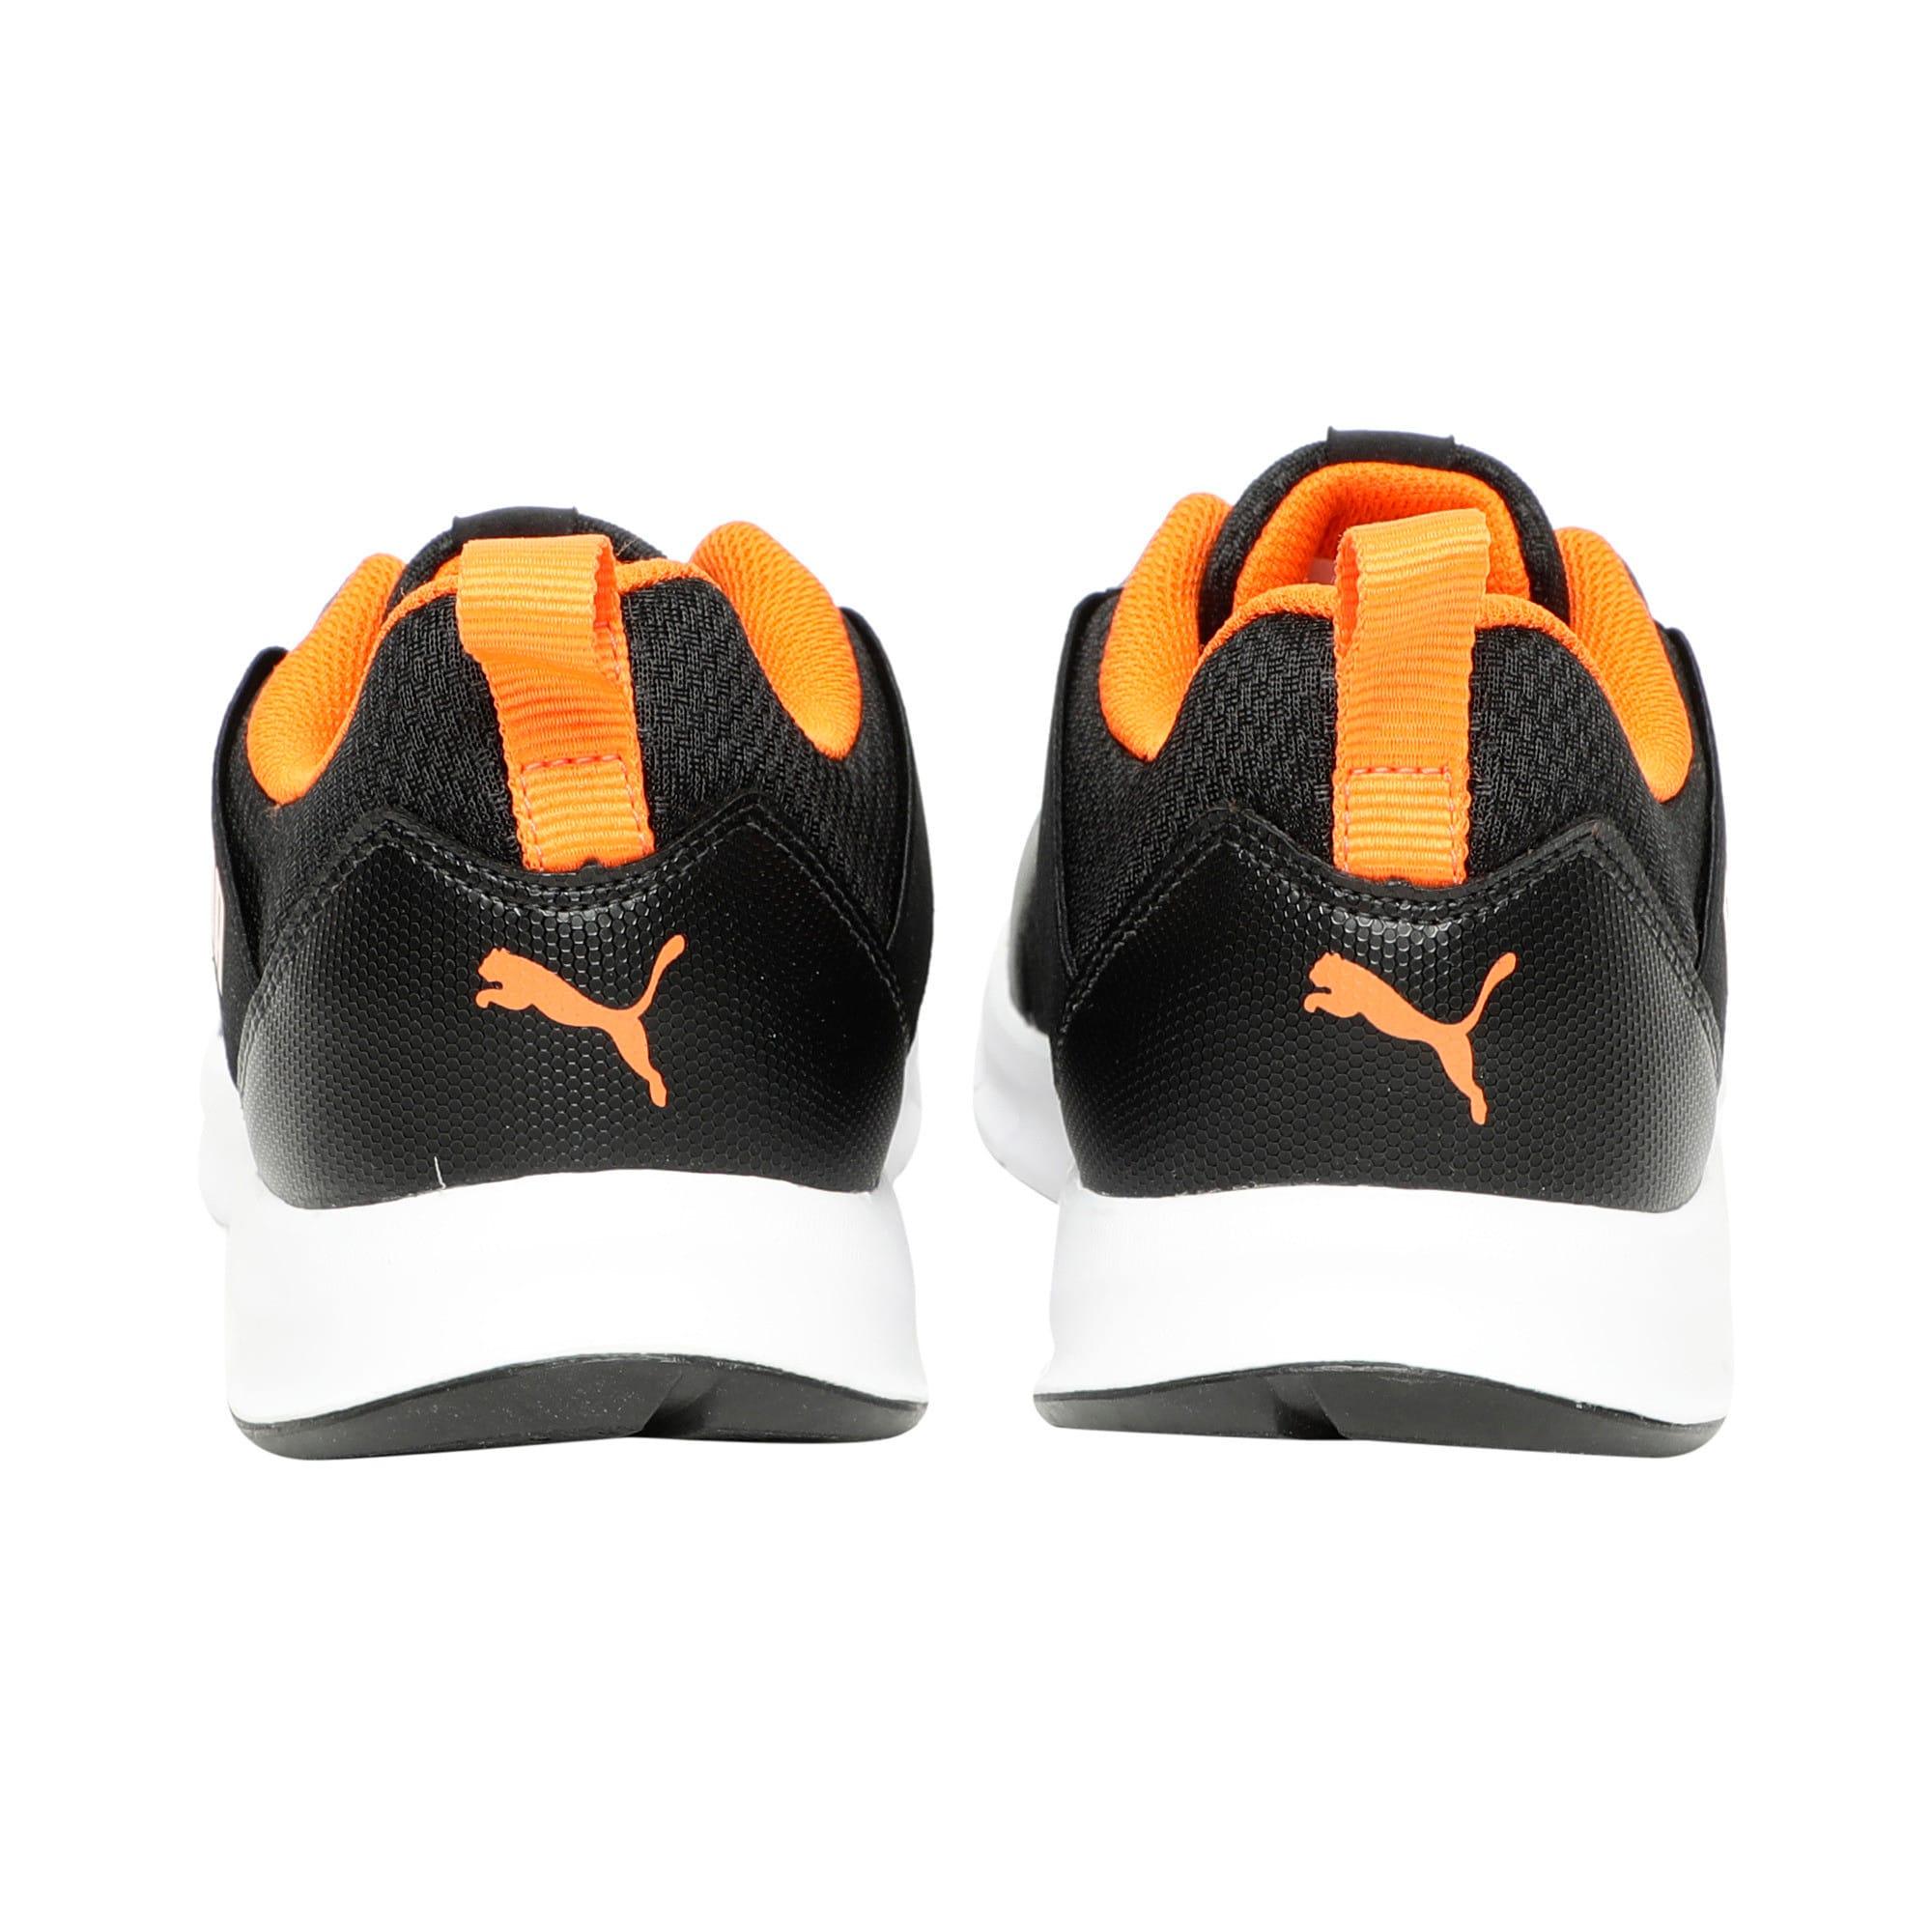 Thumbnail 3 of Movemax IDP Puma Black-Vibrant Orange, Puma Black-Vibrant Orange, medium-IND